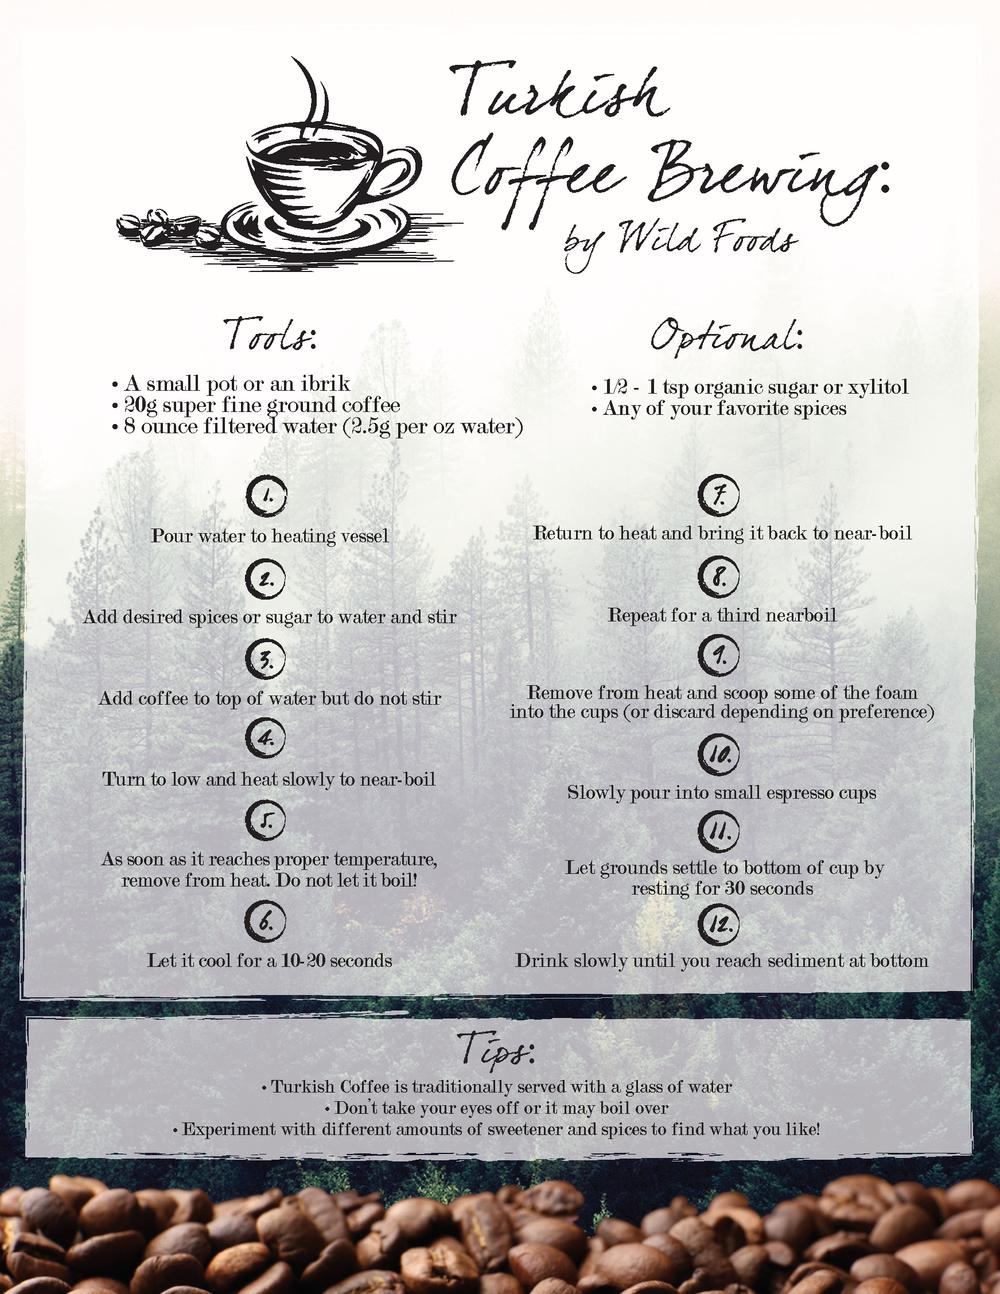 Brewing Turkish Coffee